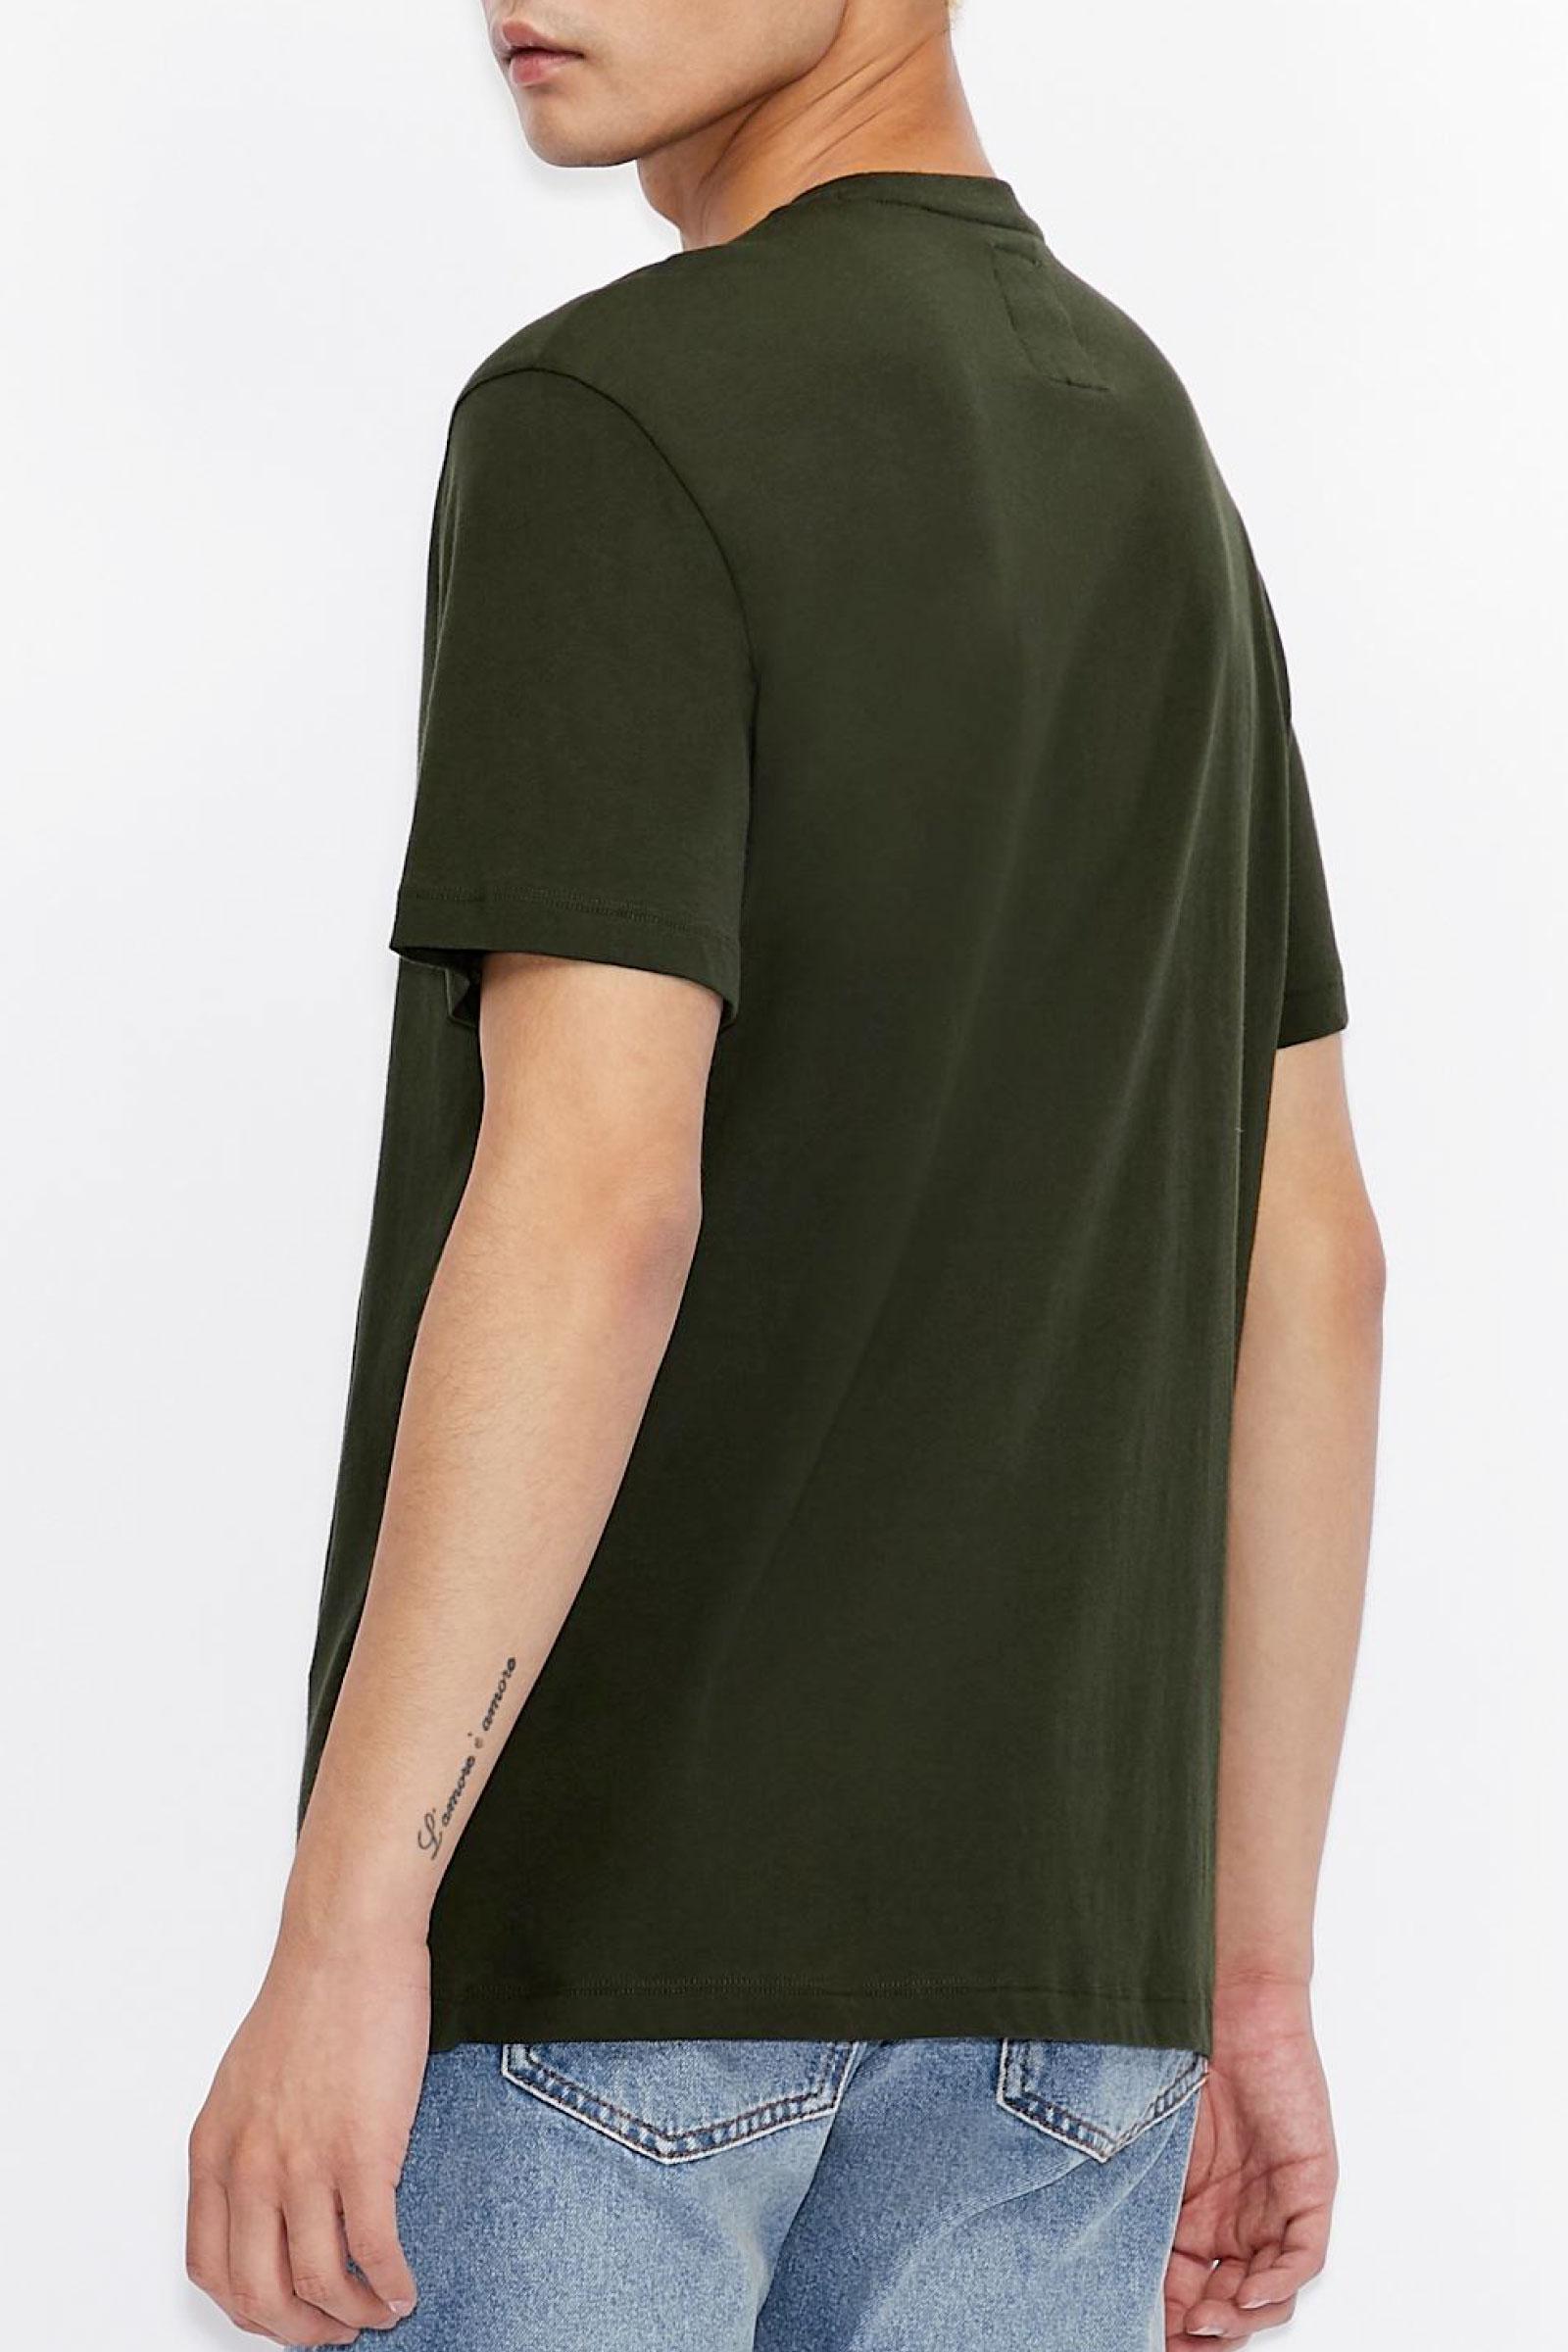 ARMANI EXCHANGE T-Shirt Uomo ARMANI EXCHANGE | T-Shirt | 8NZTPA ZJH4Z1851